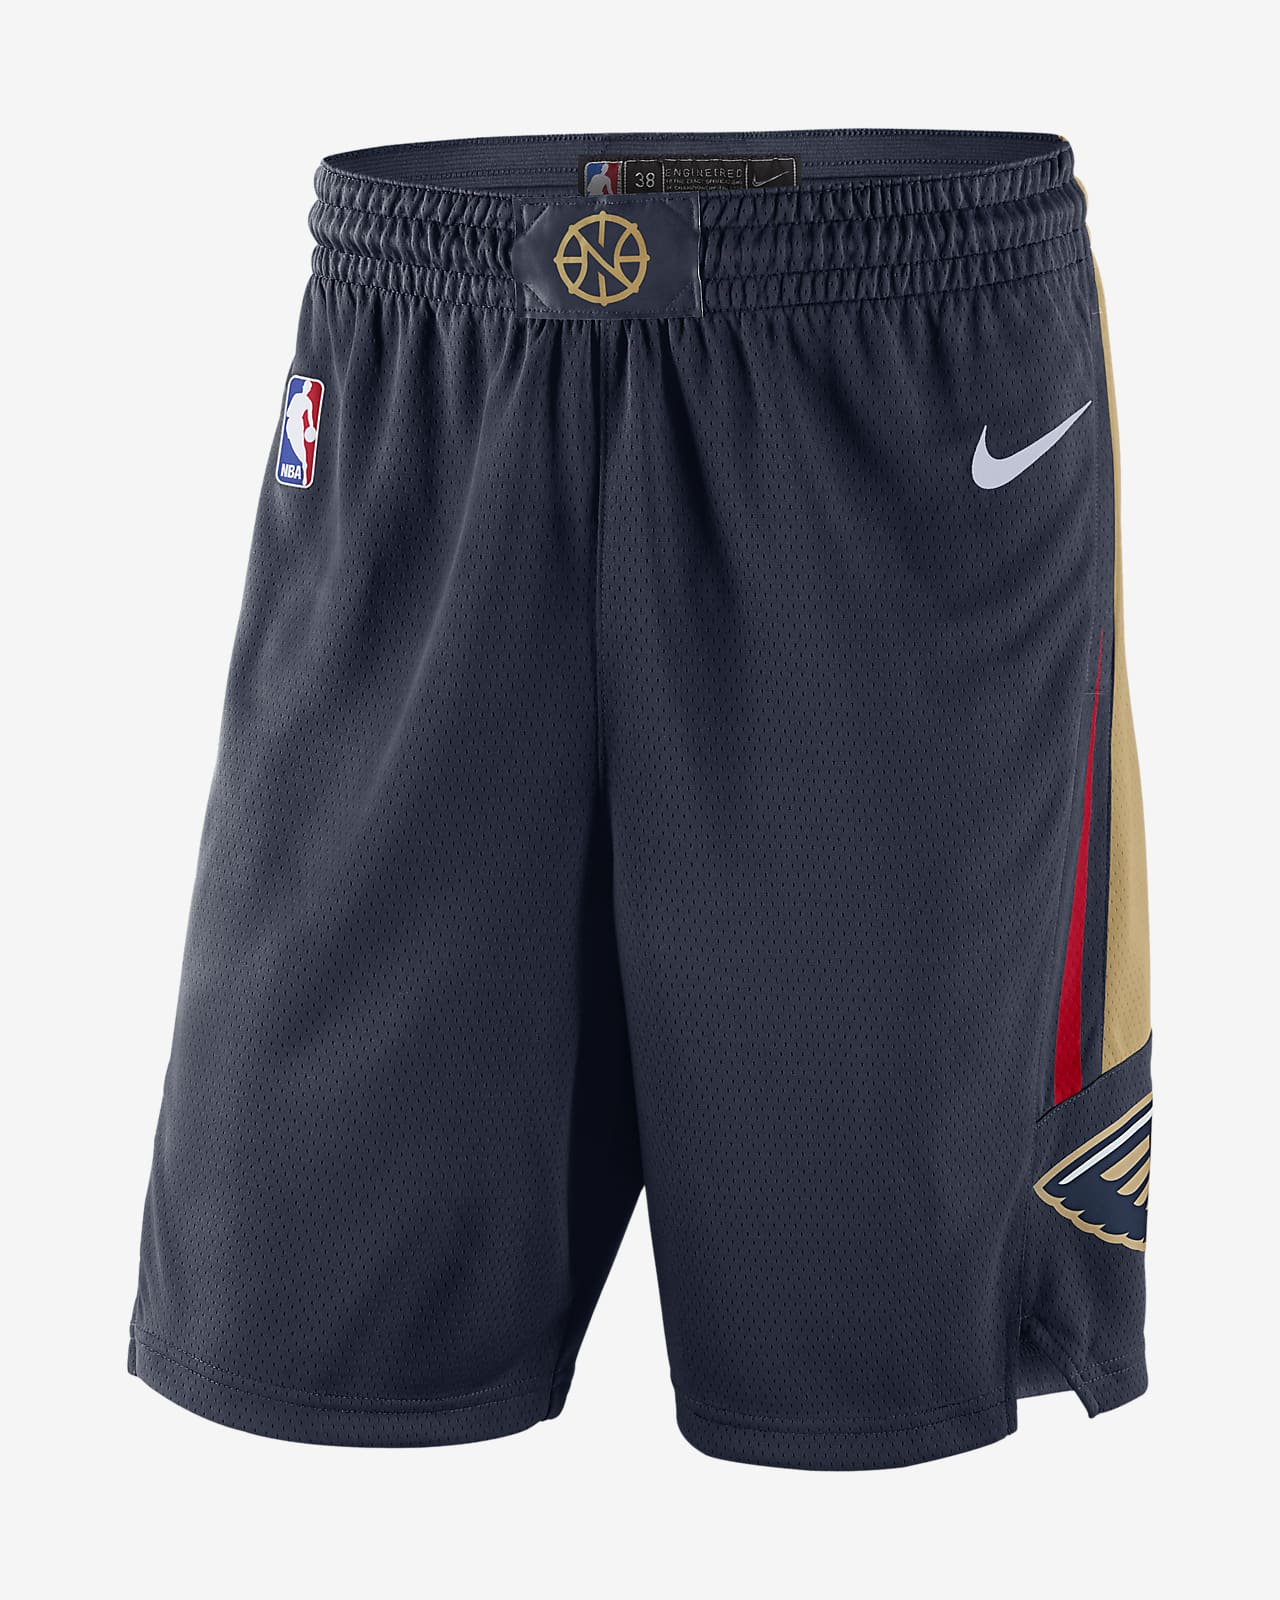 New Orleans Pelicans Icon Edition Nike NBA Swingman Erkek Şortu